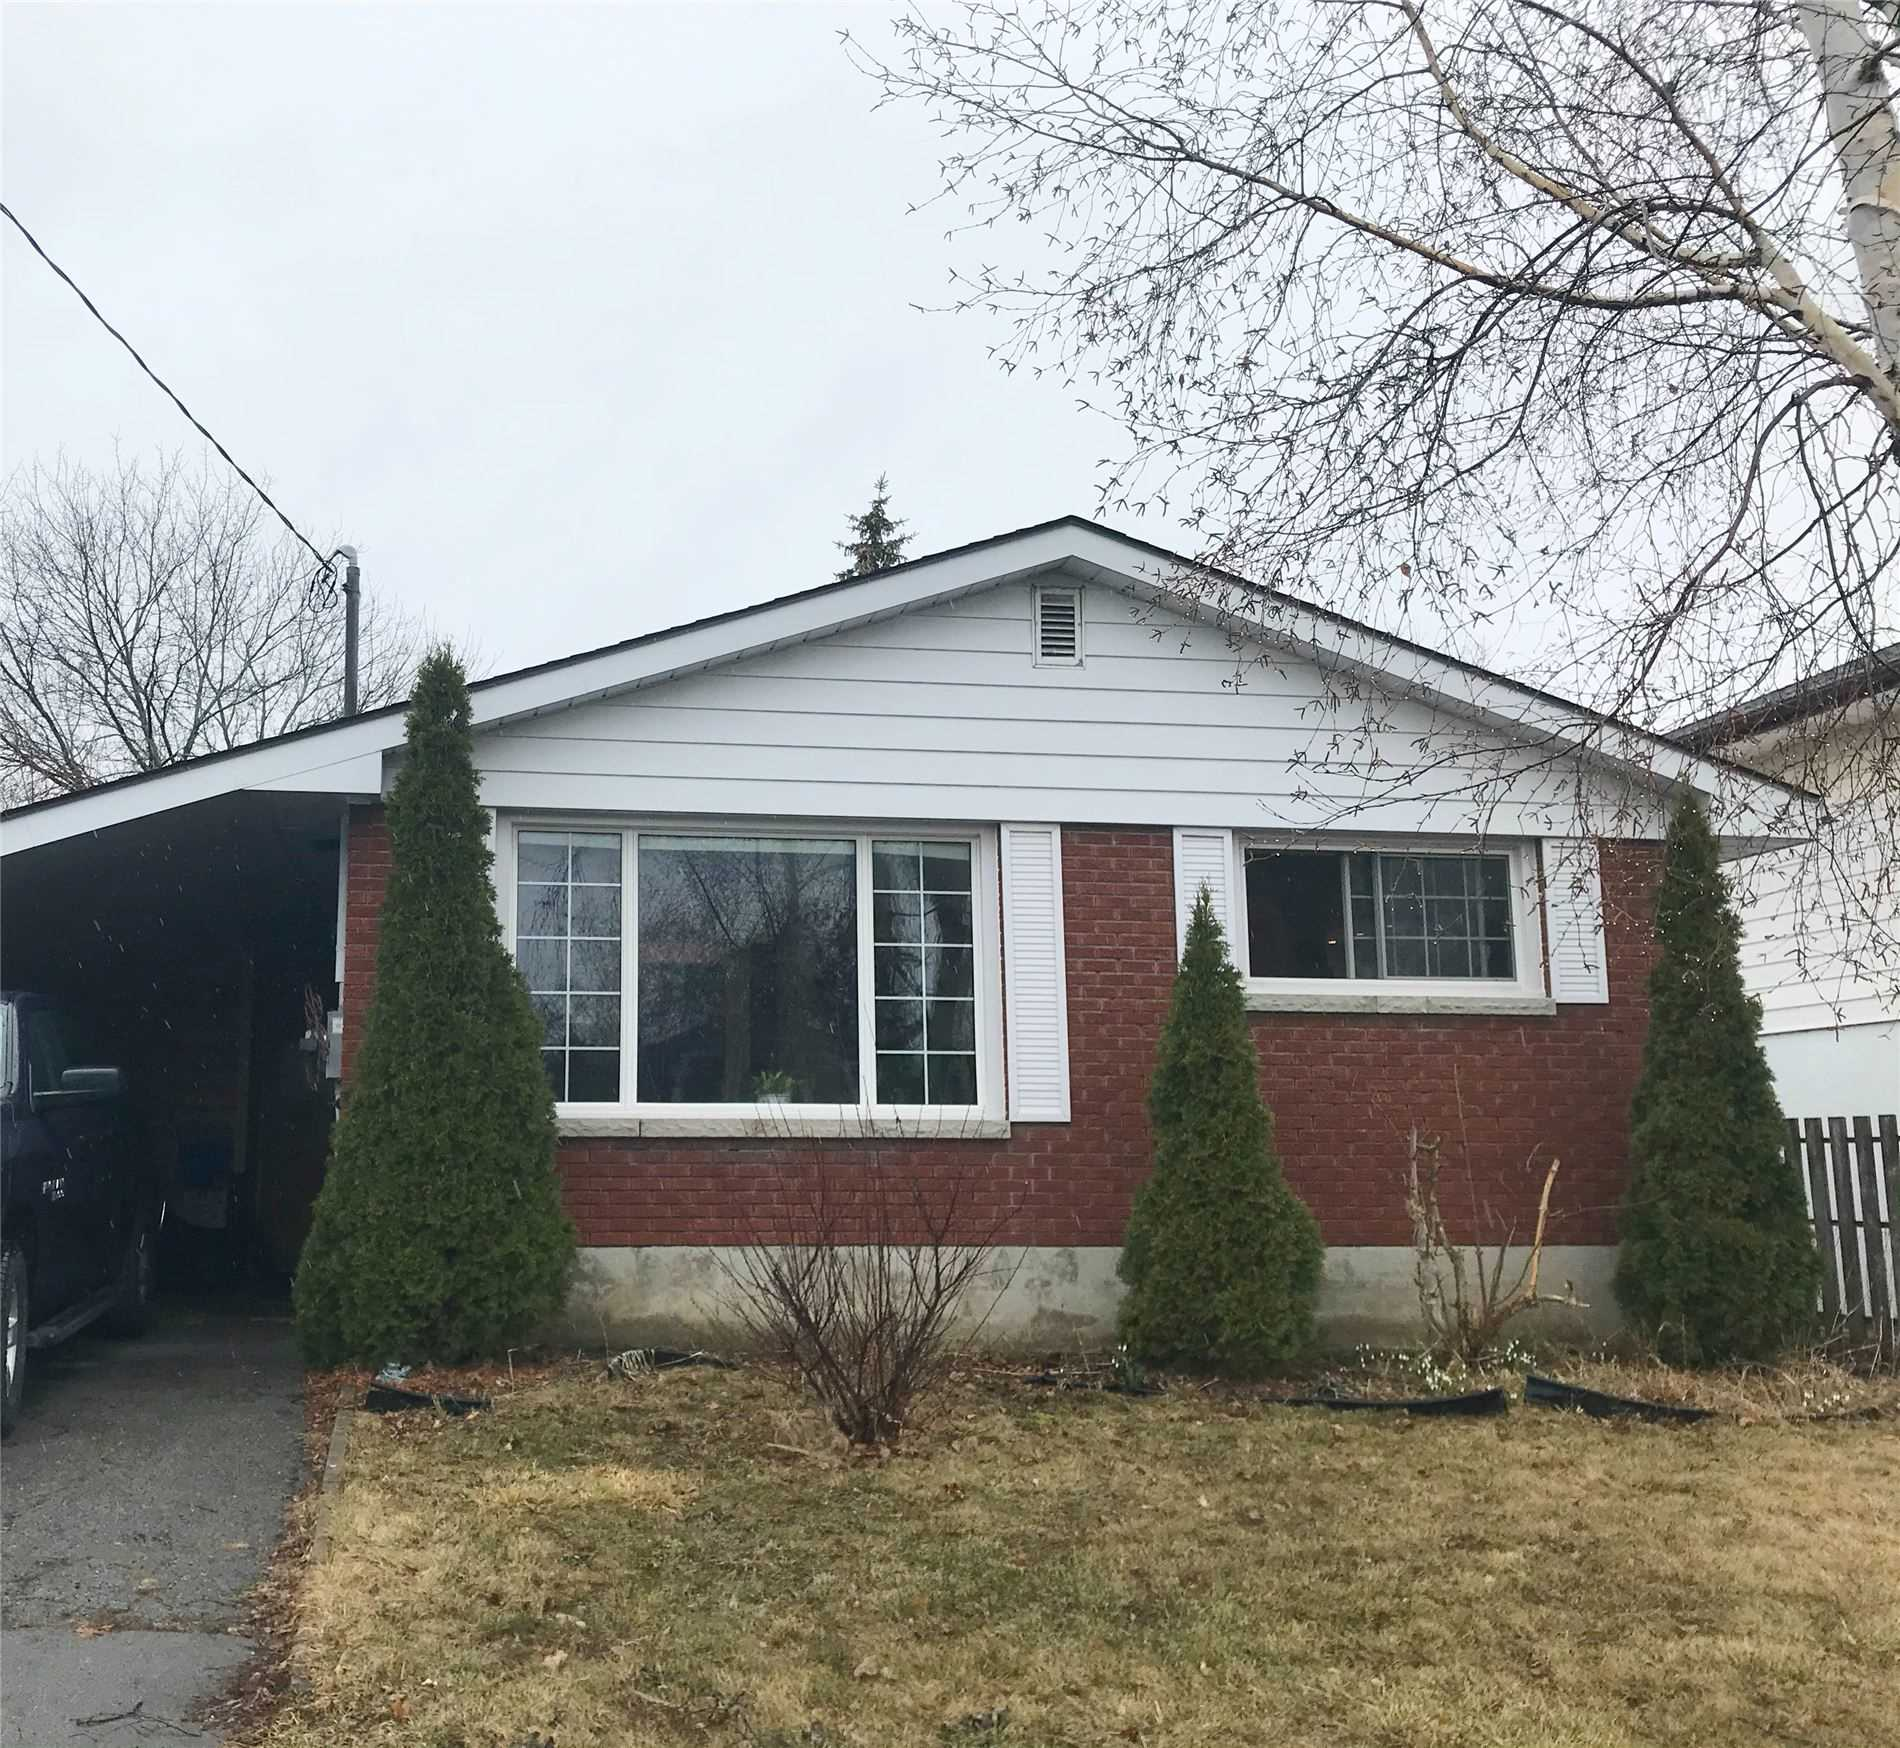 276 Haig Rd, Belleville, Ontario K8N 4R2, 4 Bedrooms Bedrooms, ,1 BathroomBathrooms,Detached,For Sale,Haig,X5176049